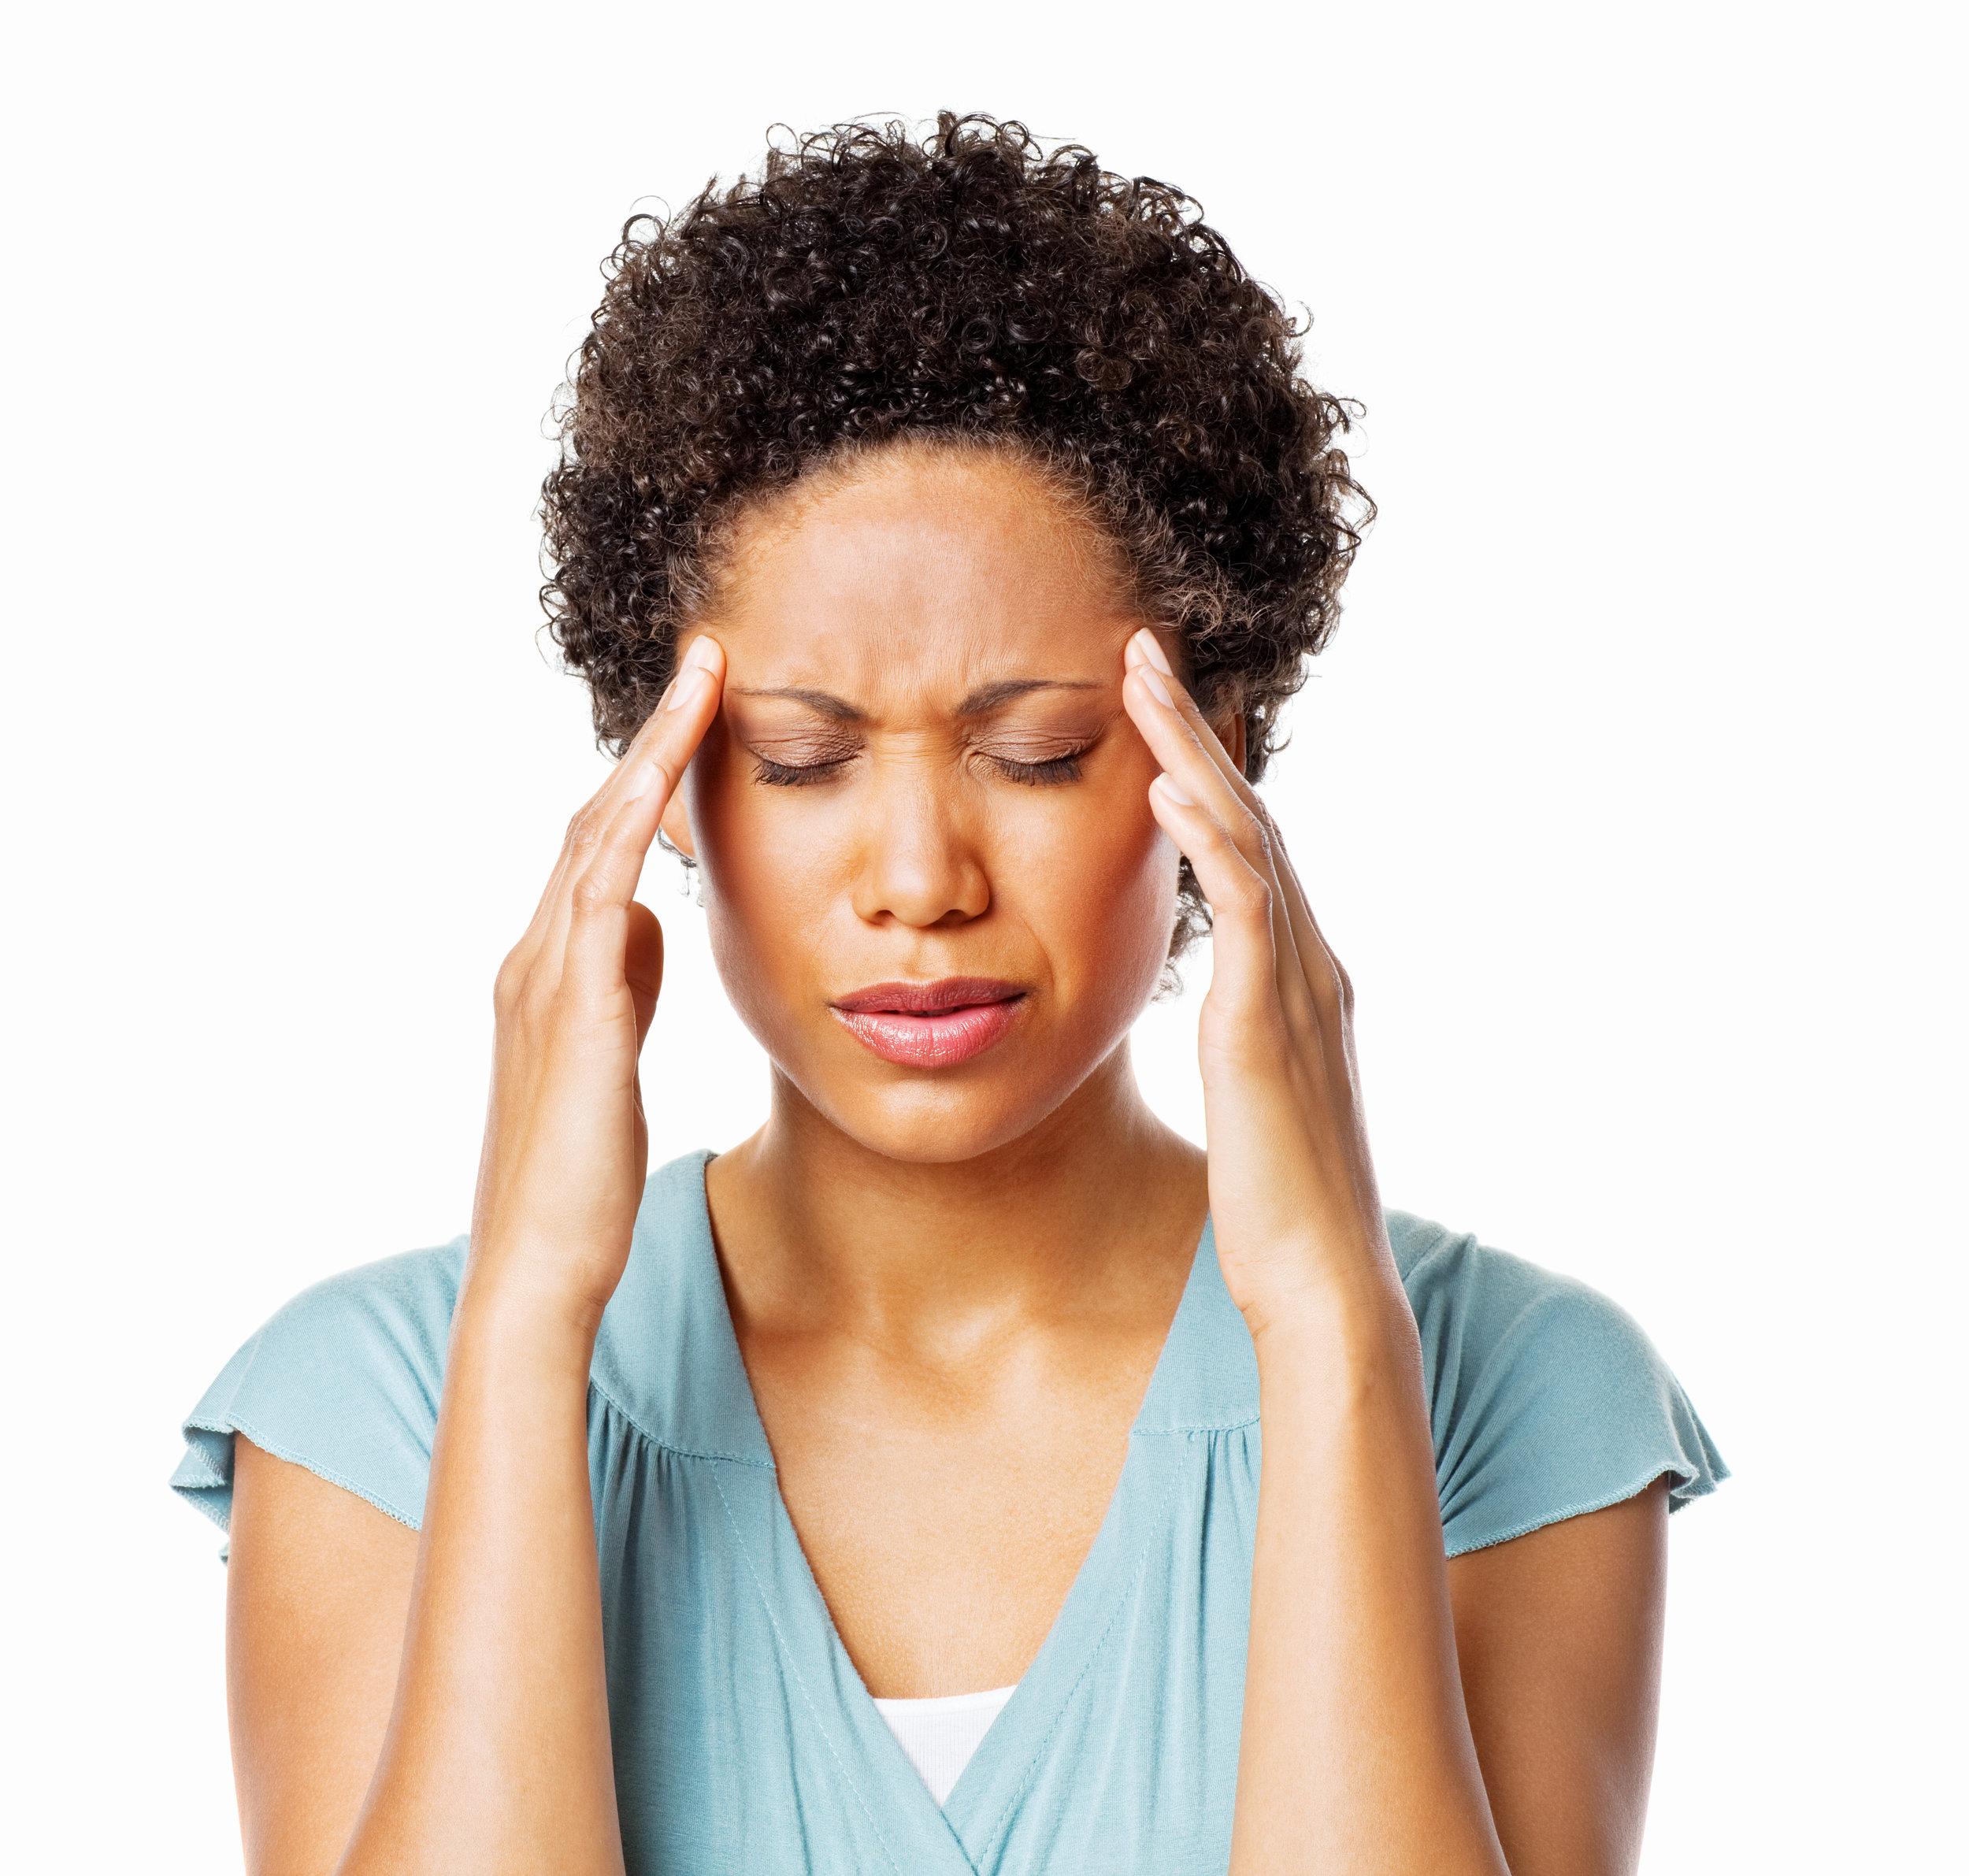 iStock-Migraine, headache, woman.jpg